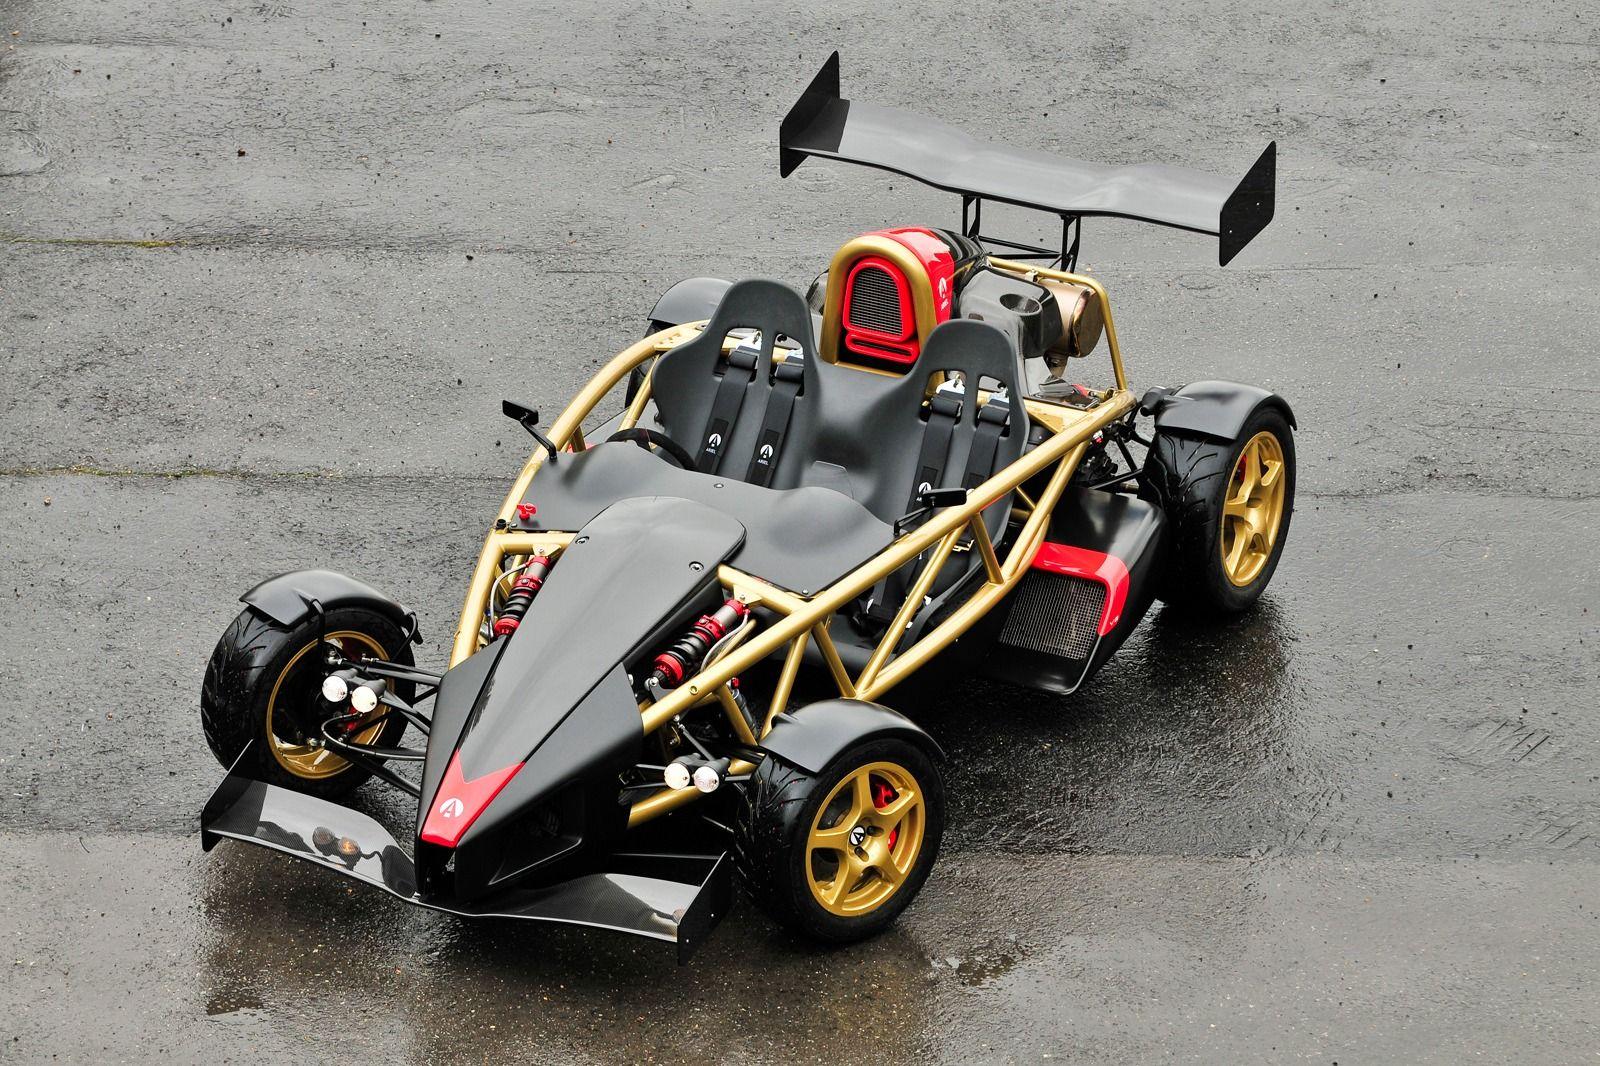 Ariel Atom V8 | Yes! It is street legal! | Cars | Pinterest